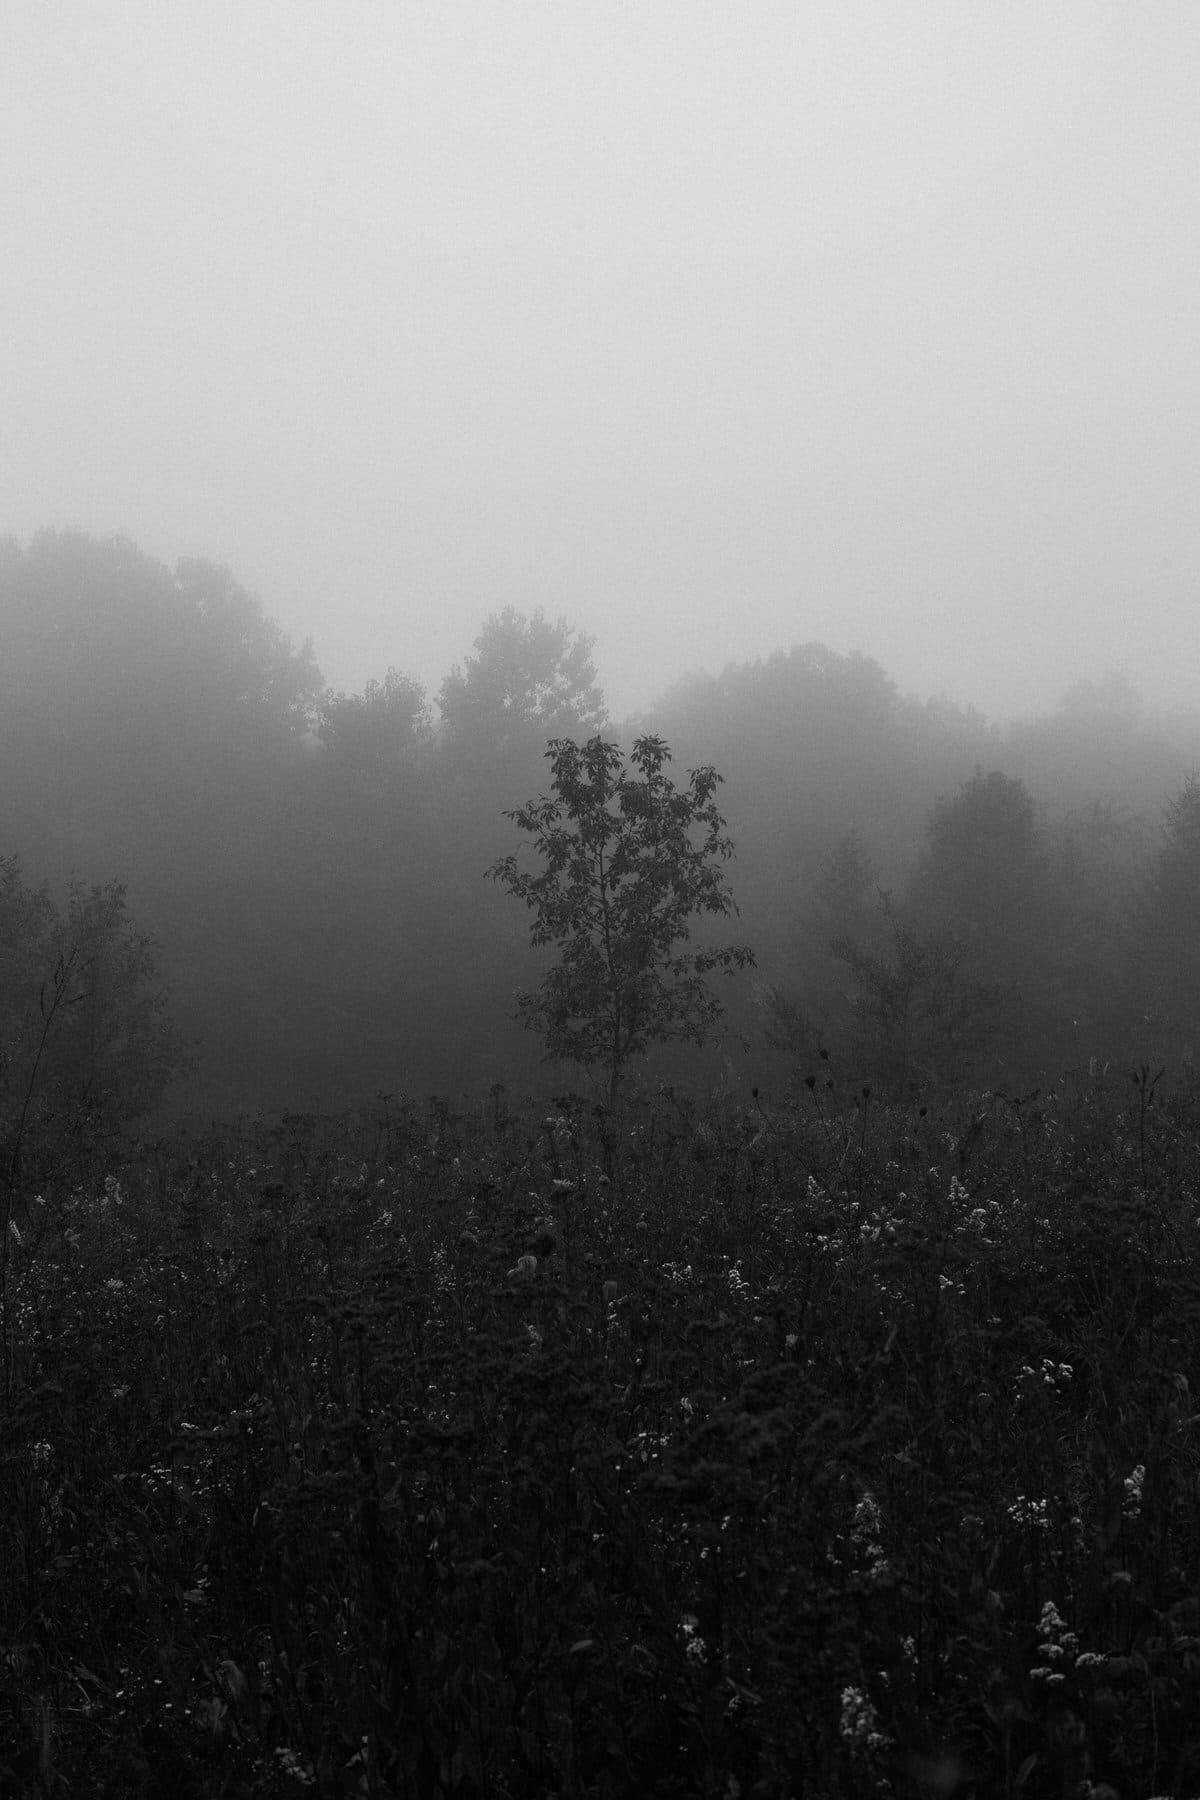 Kiekhaefer-Park-Fond-du-Lac-Wisconsin-black-and-white-fine-art-photography-by-Studio-L-photographer-Laura-Schneider-_3395